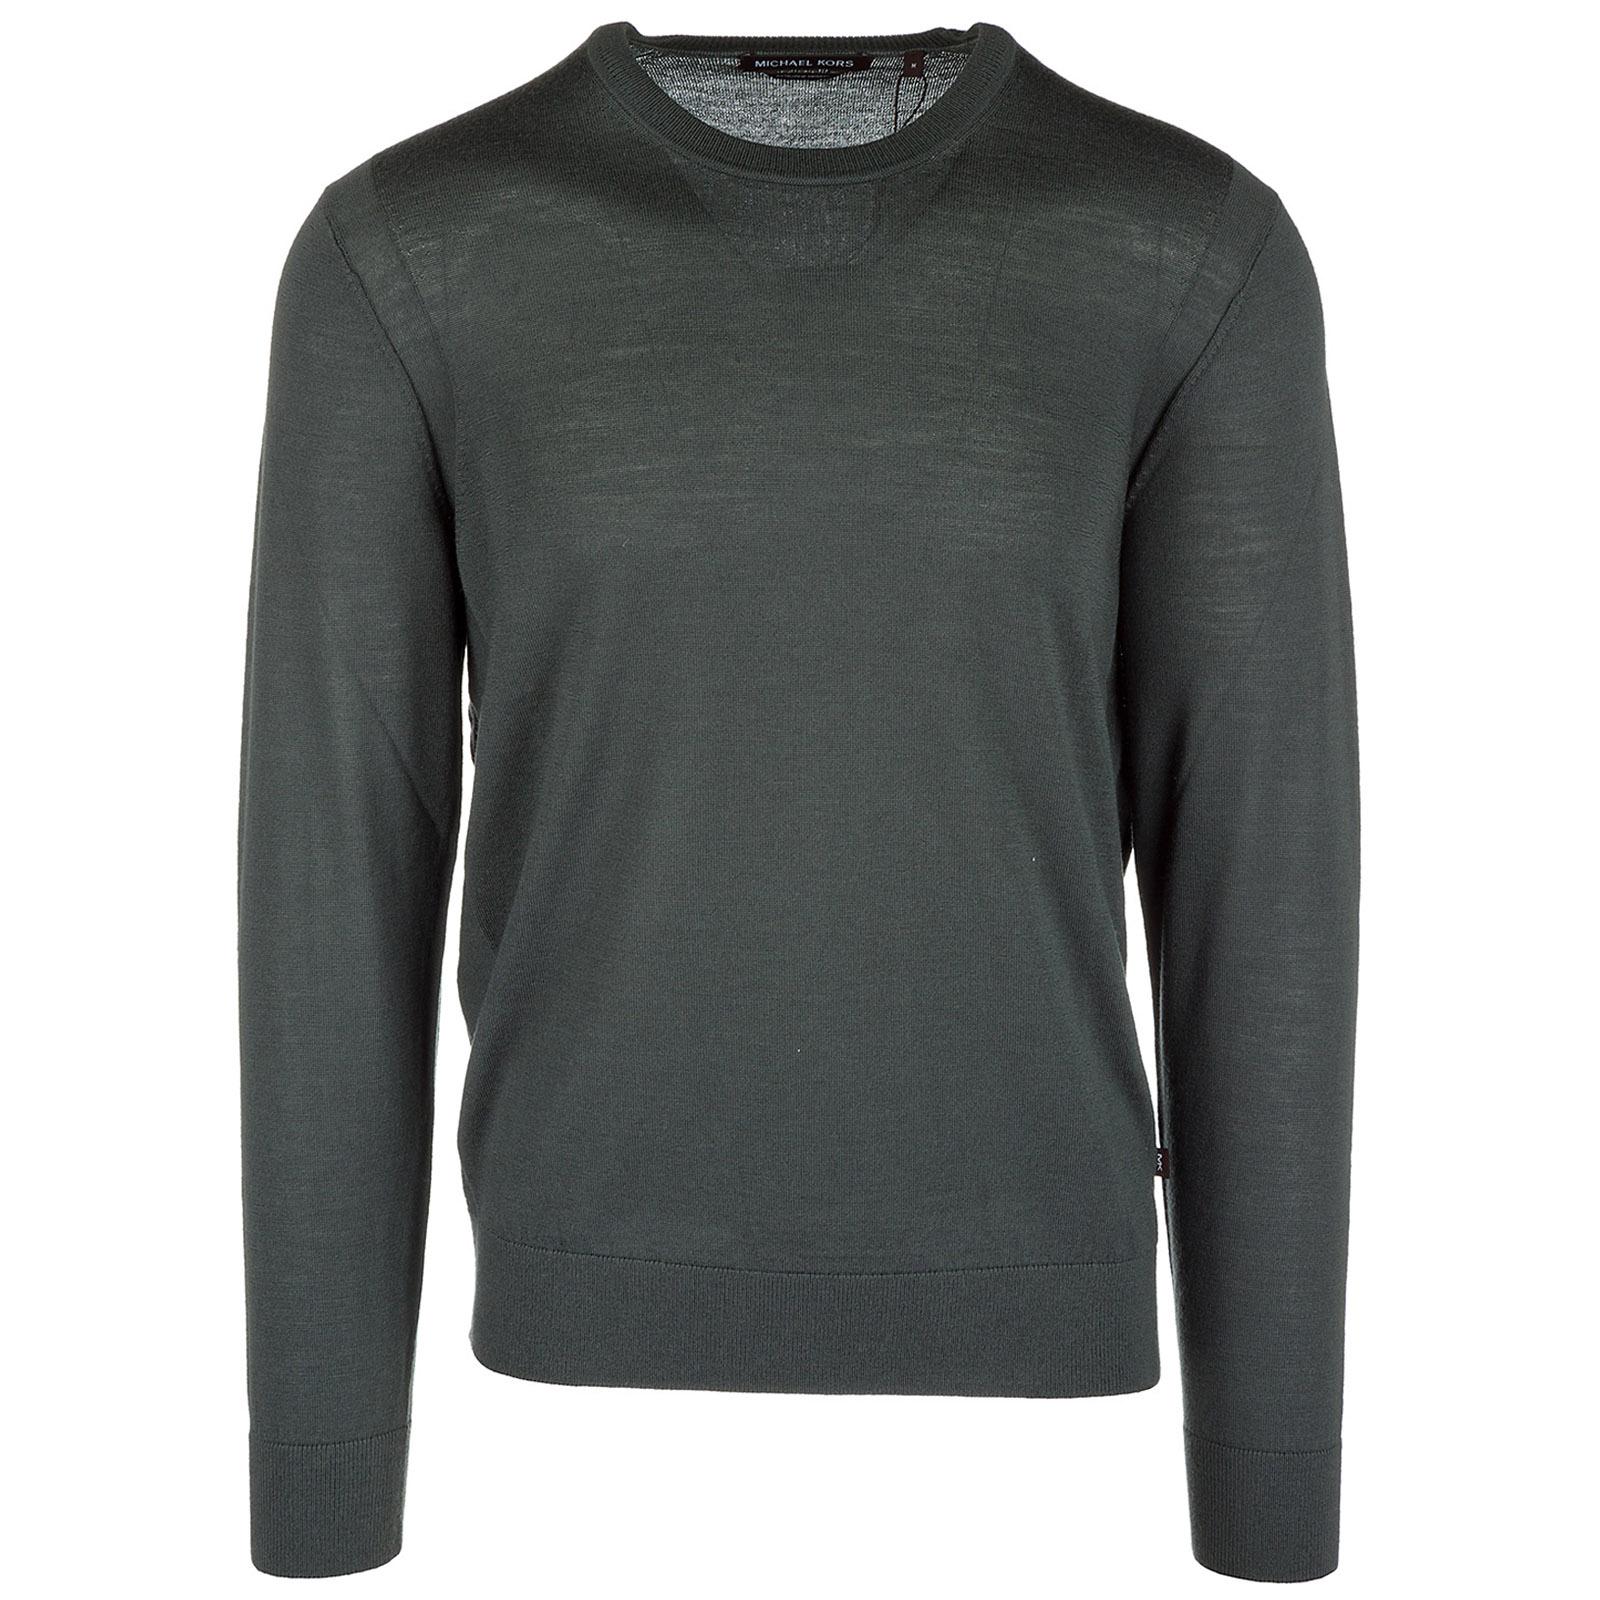 5e057d859e0299 Michael Kors Men's crew neck neckline jumper sweater pullover